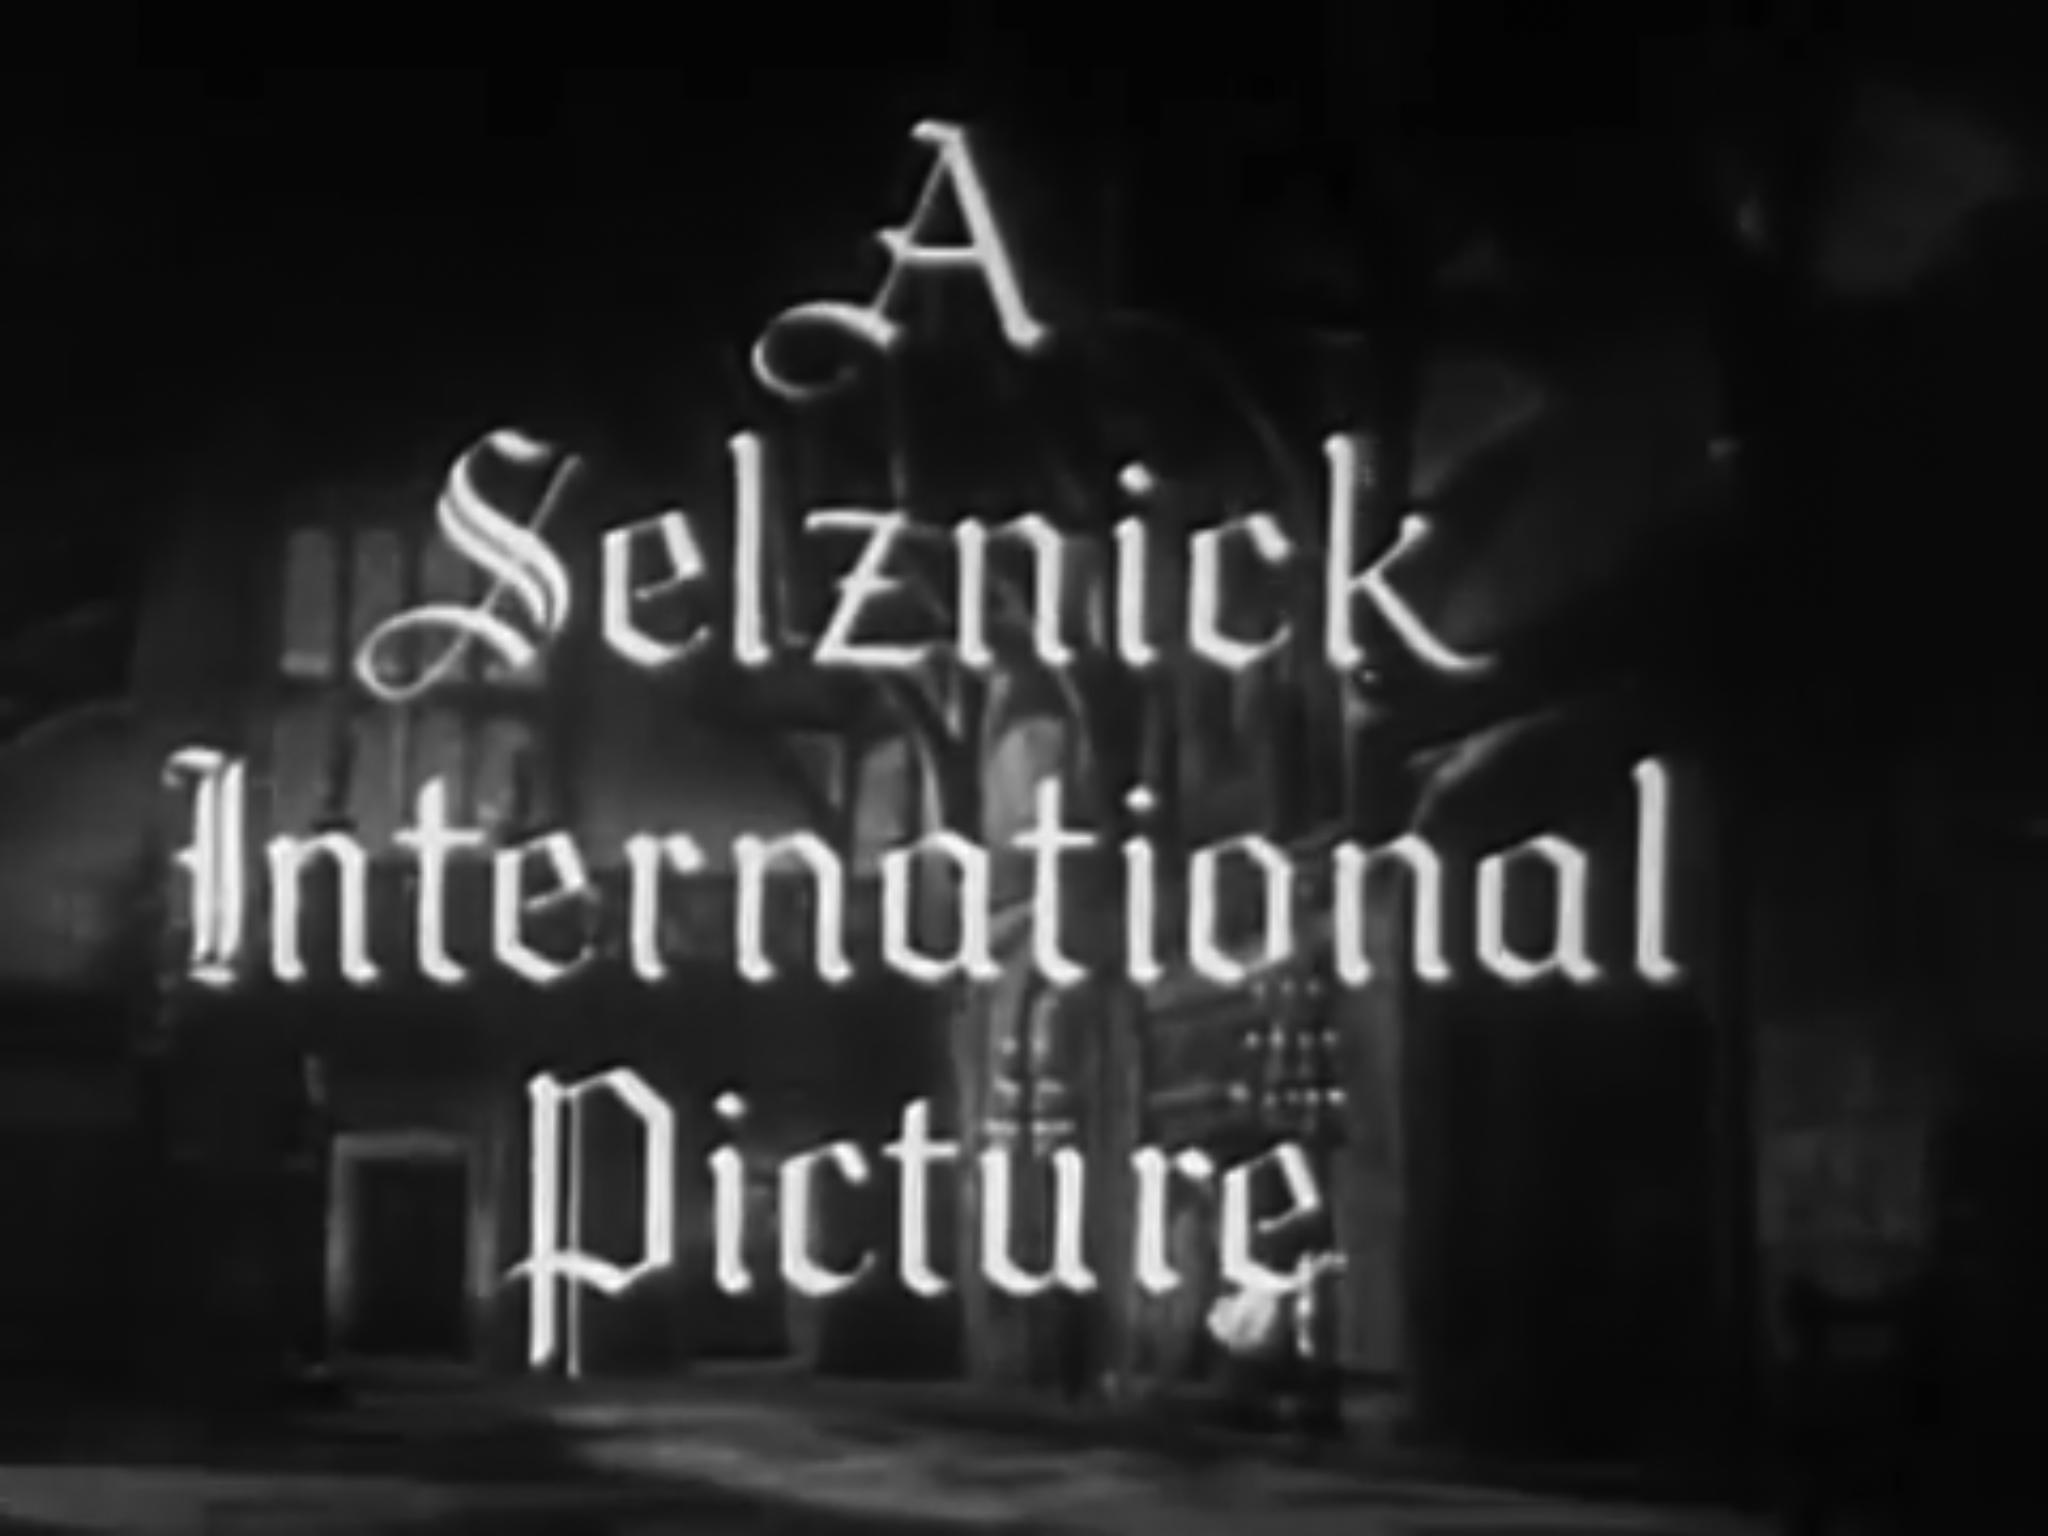 The Selznick Studio